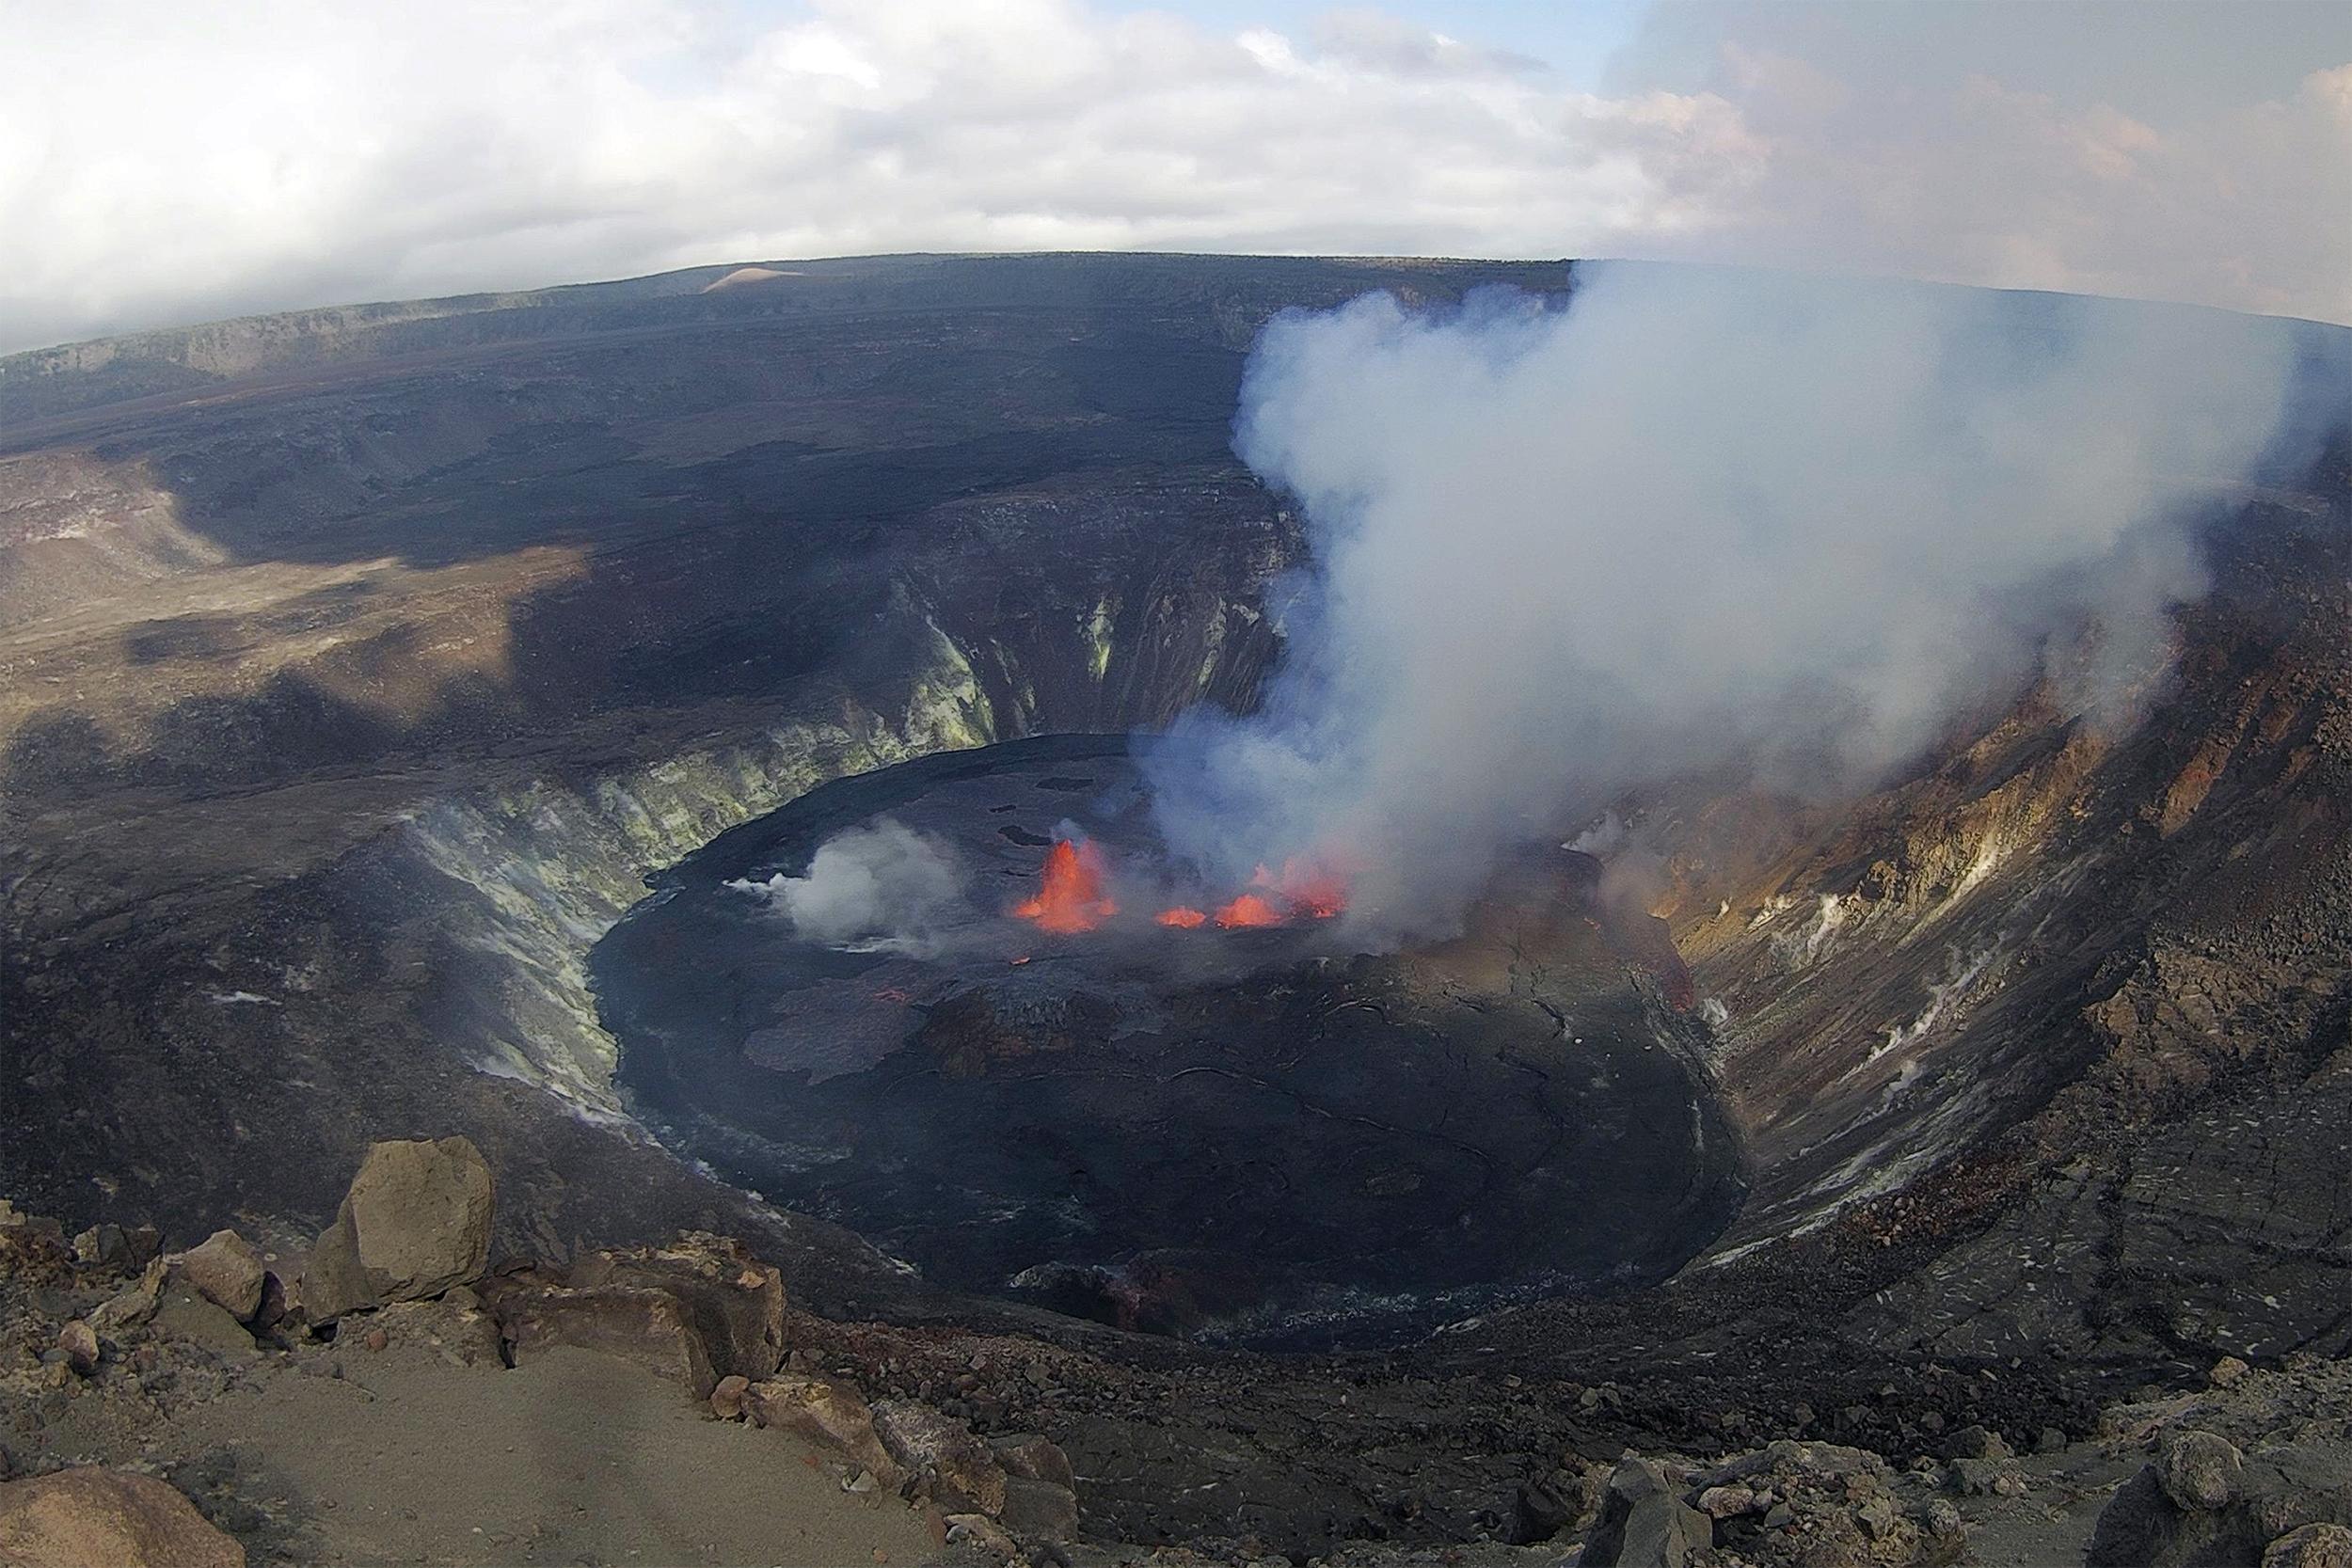 Hawaii's Kilauea volcano erupts within national park